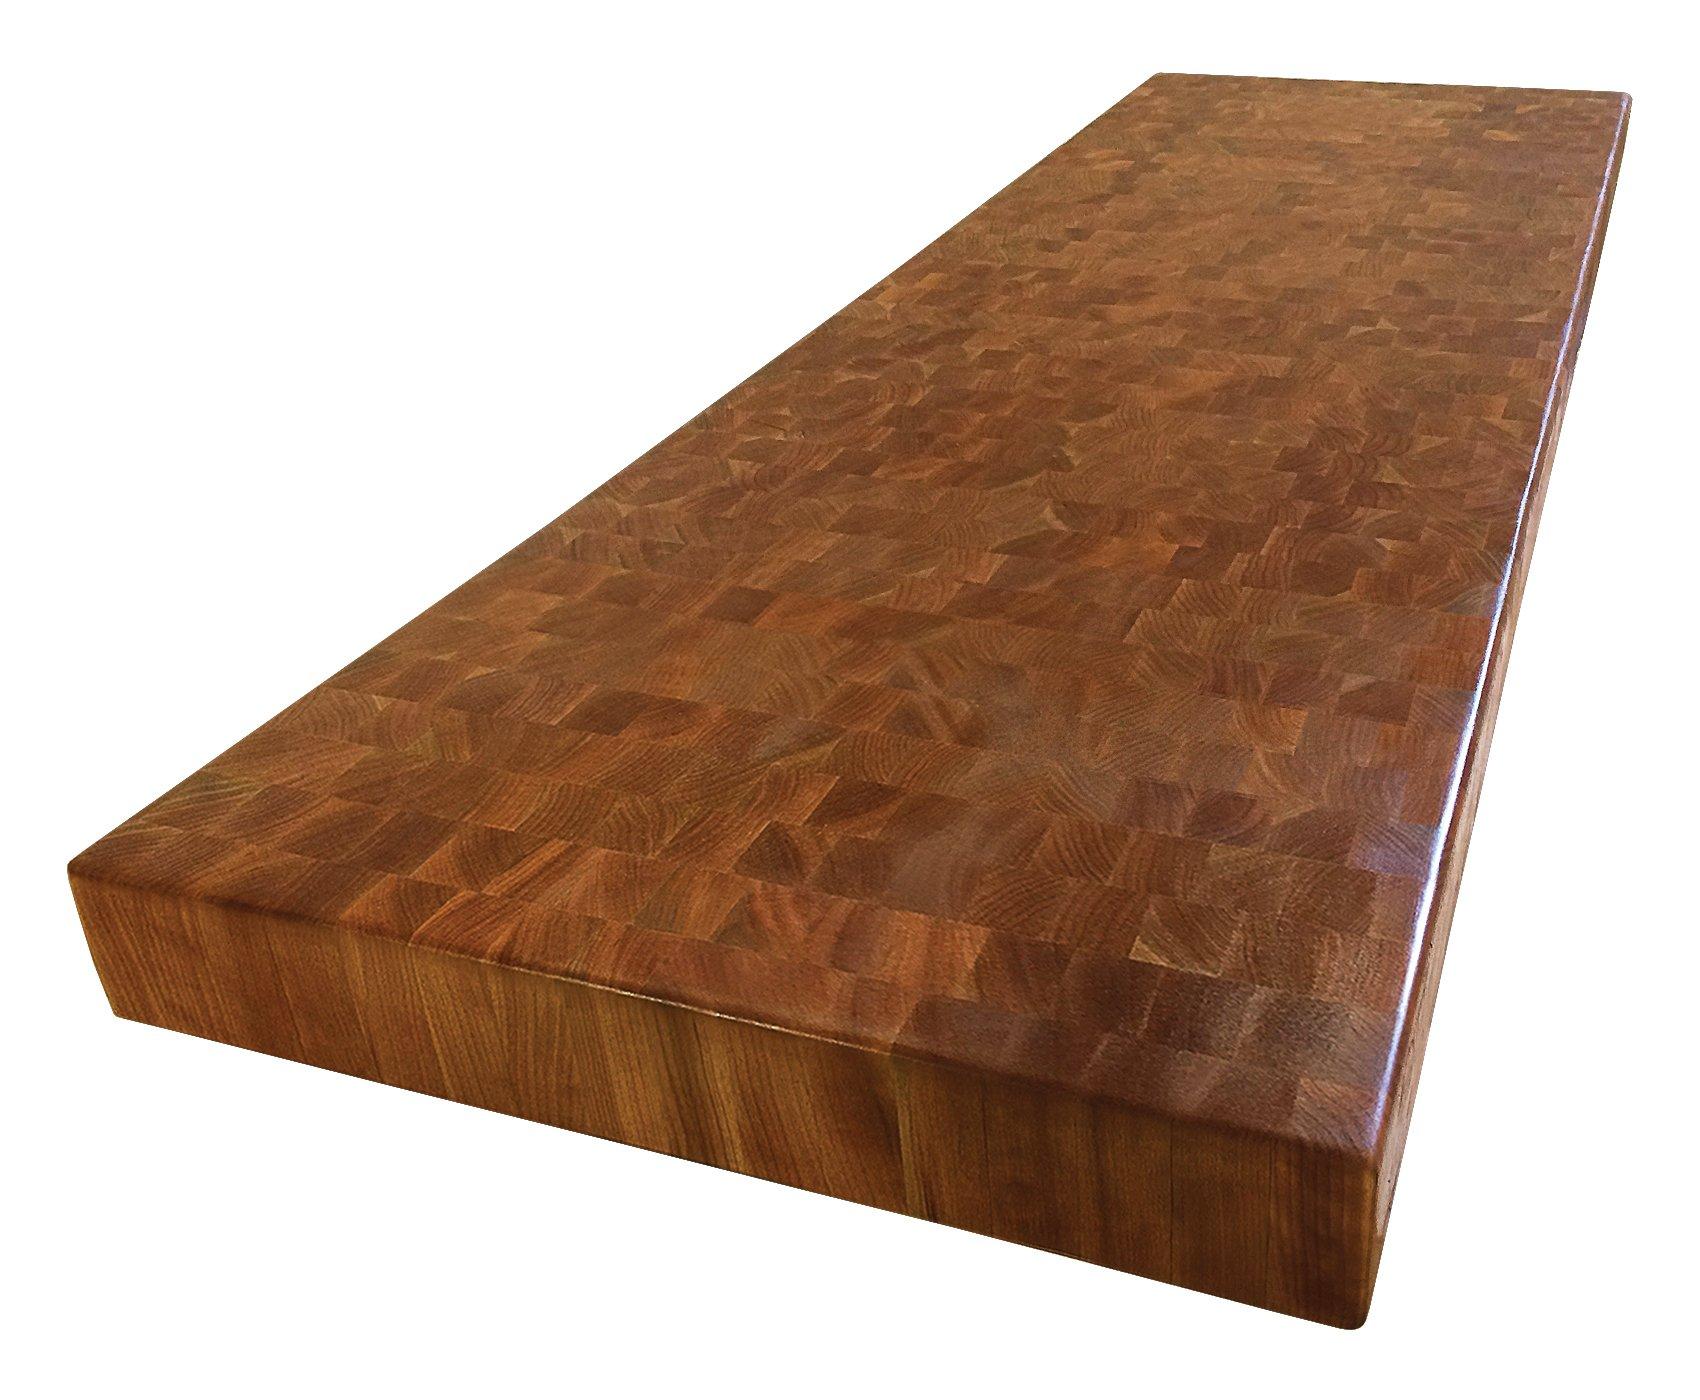 Armani Fine Woodworking End Grain Cherry Butcher Block Countertop